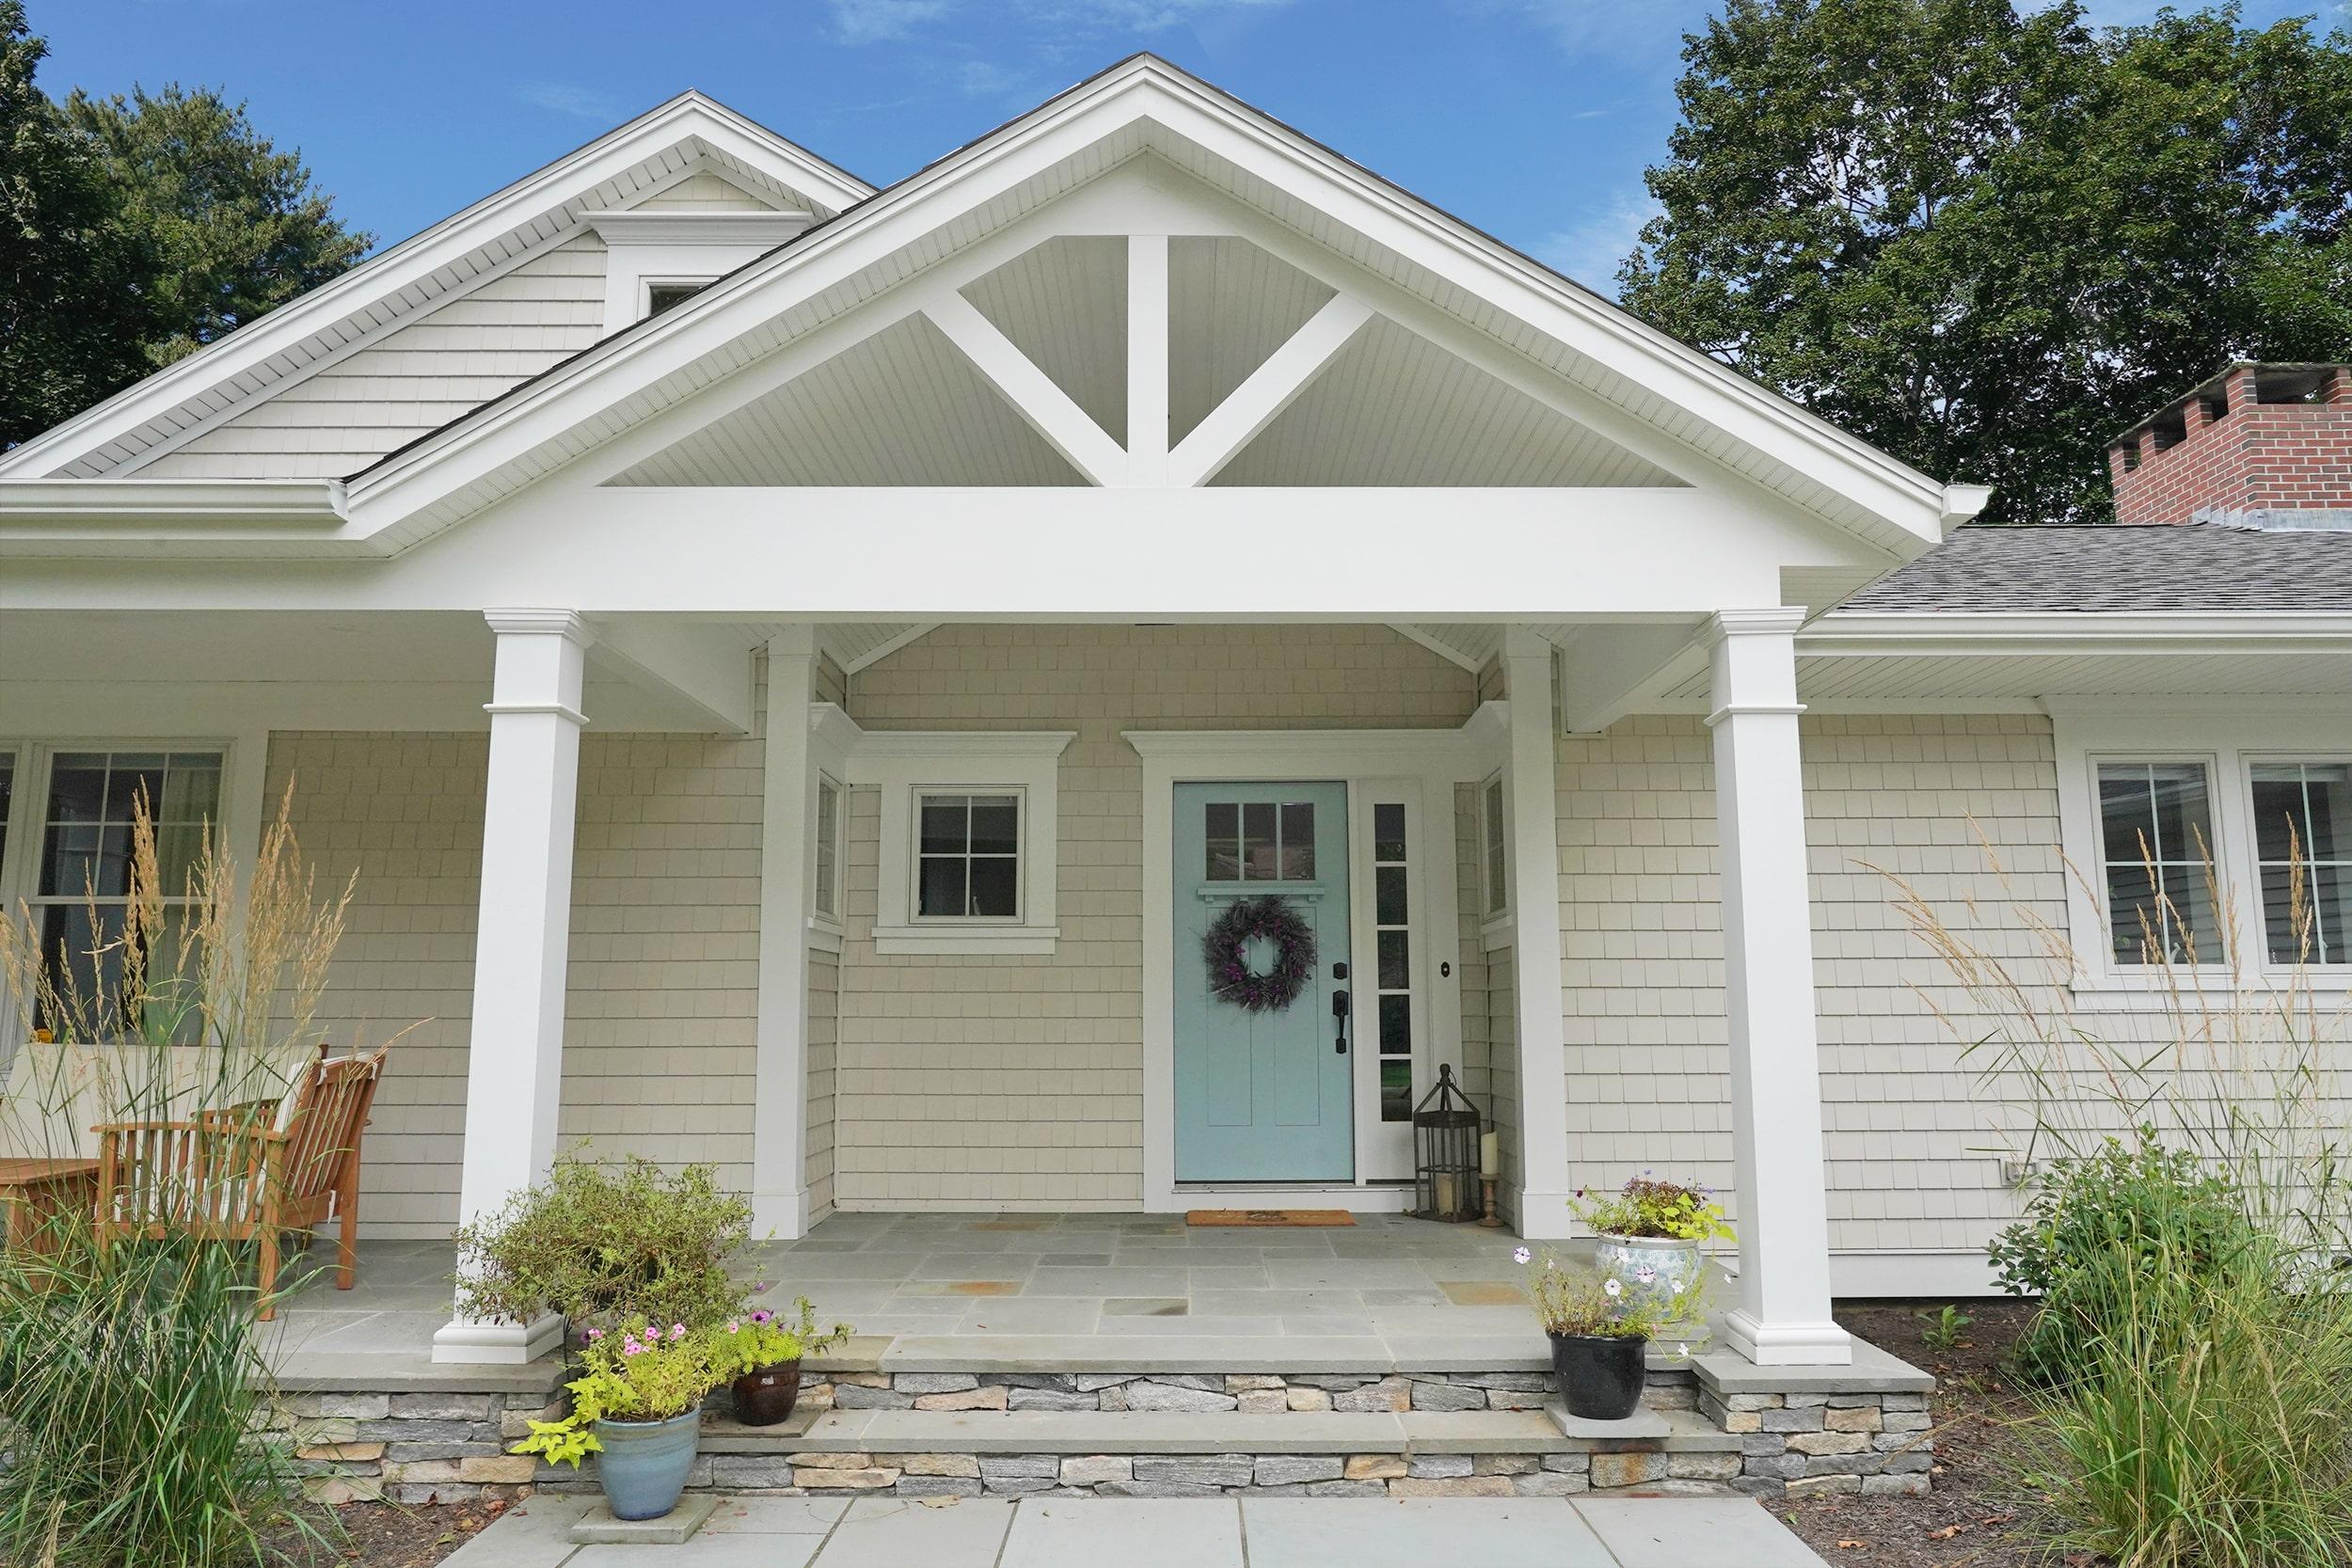 yost-home-improvements-ranch-exterior-1-min